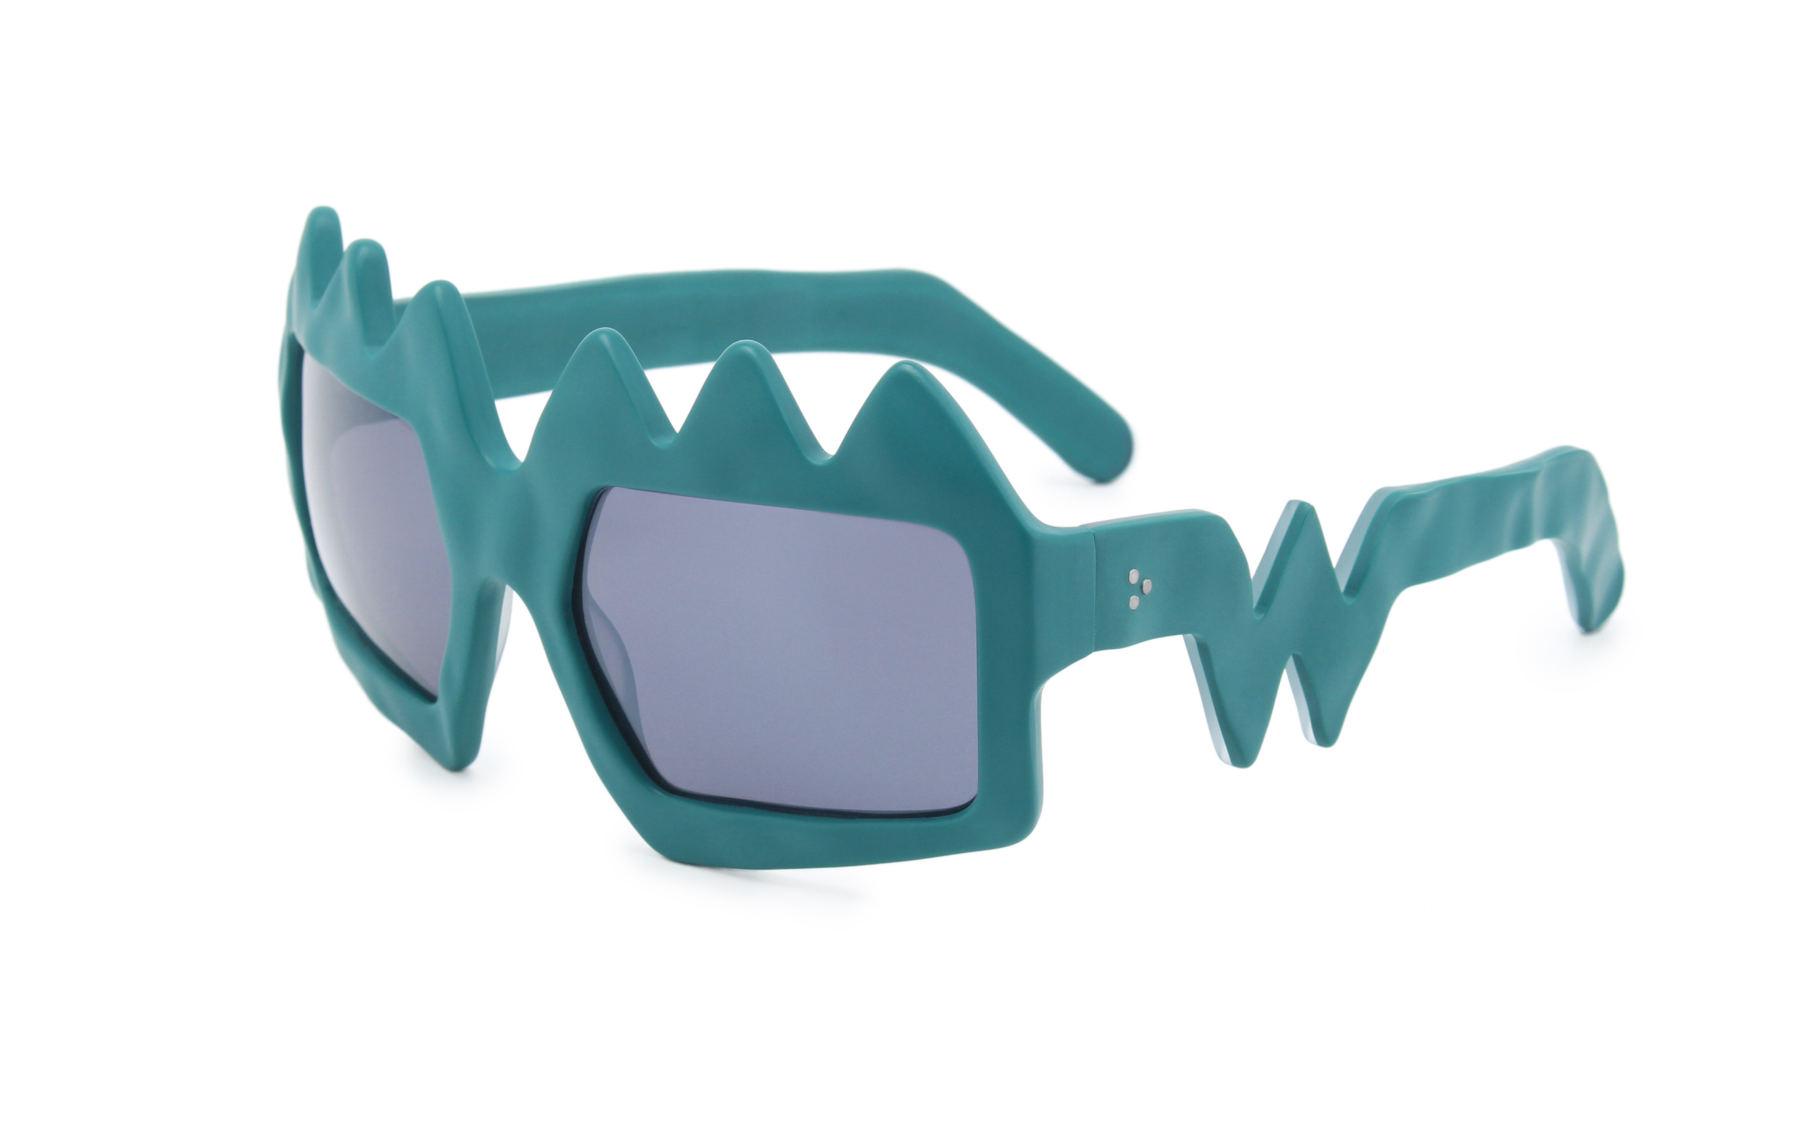 FAKBYFAK x Walter Van Beirendonck  Bliksem Sunglasses. Petrol Green Code: 09/13/05